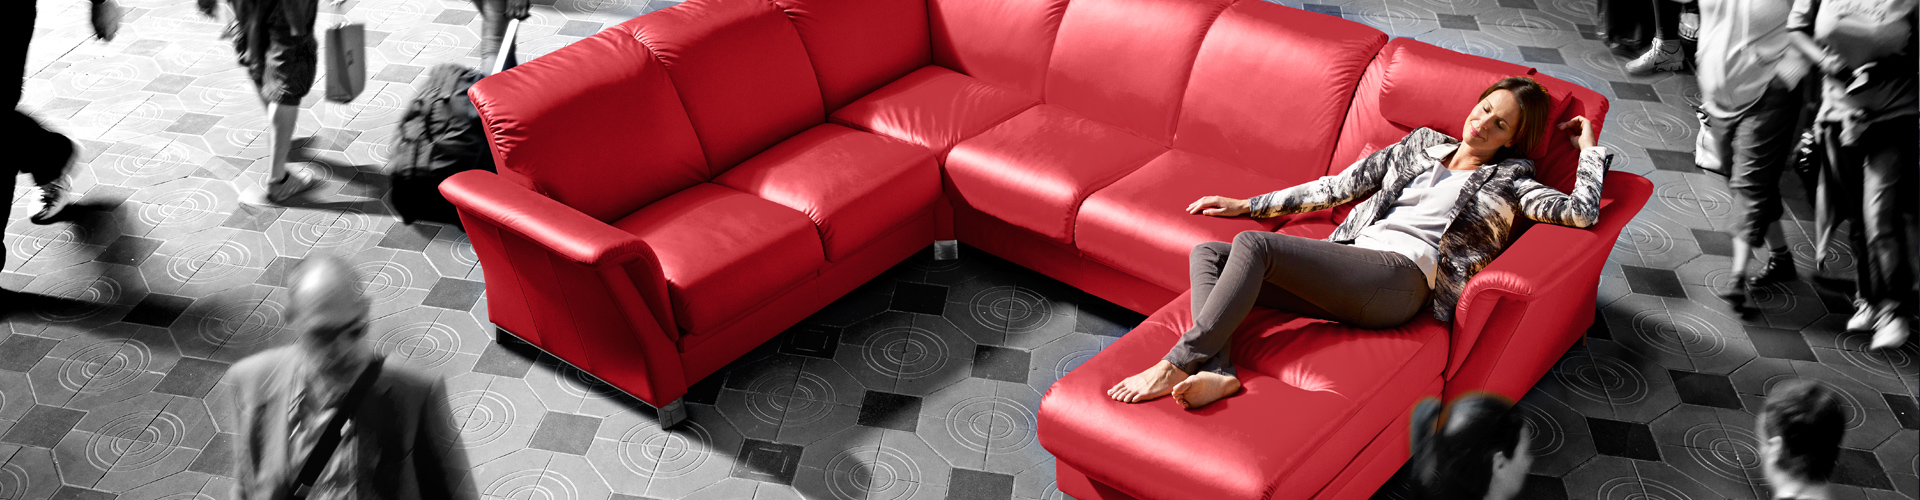 stressless-sofa-2015-001